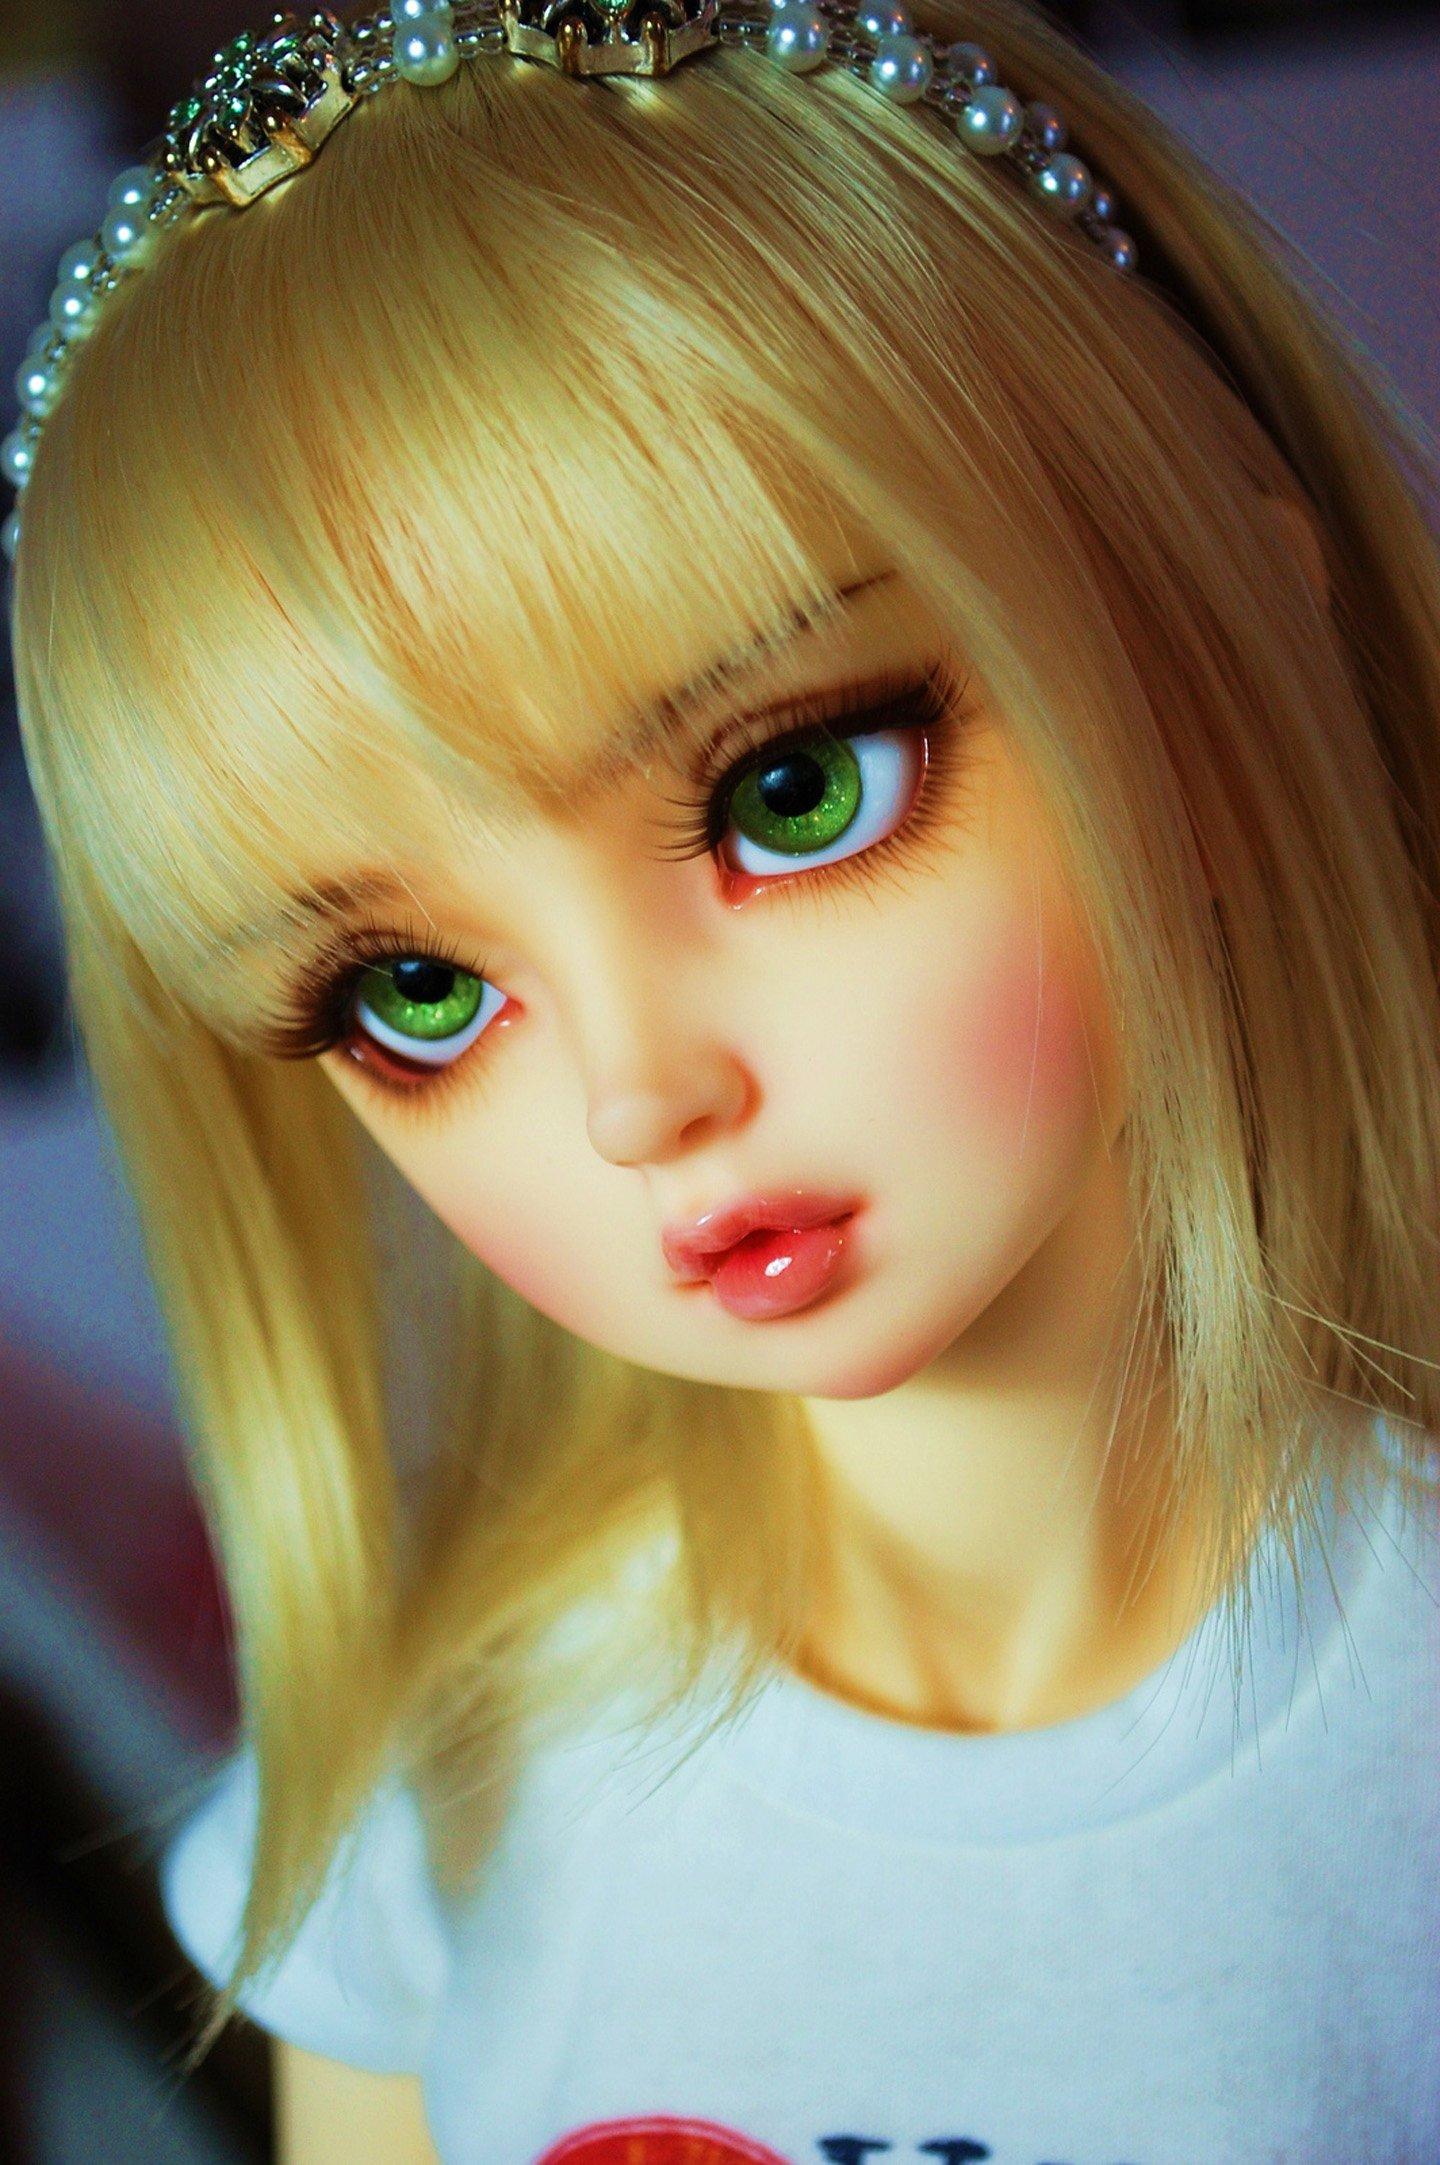 Cute Girl N Boy Wallpapers Doll Blonde Green Eyes Toys Beautiful Wallpaper